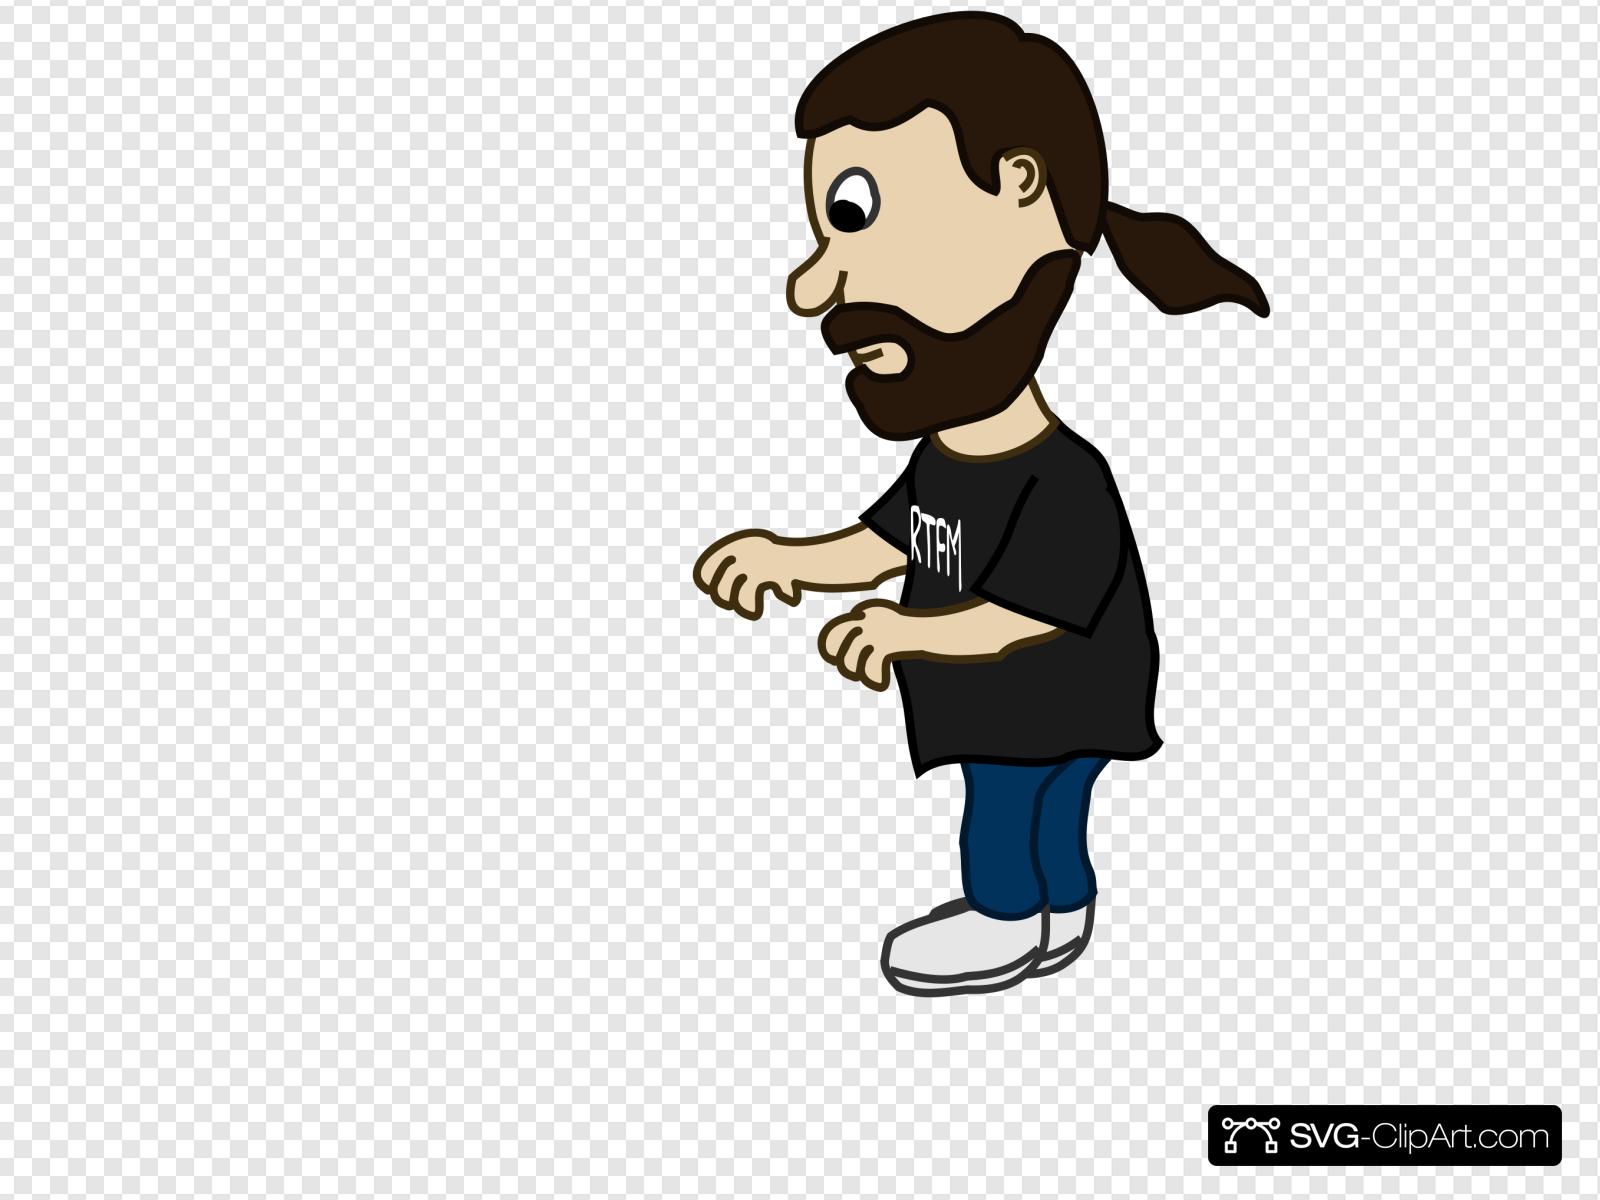 Man pushing clipart image transparent download Man Pushing Clip art, Icon and SVG - SVG Clipart image transparent download